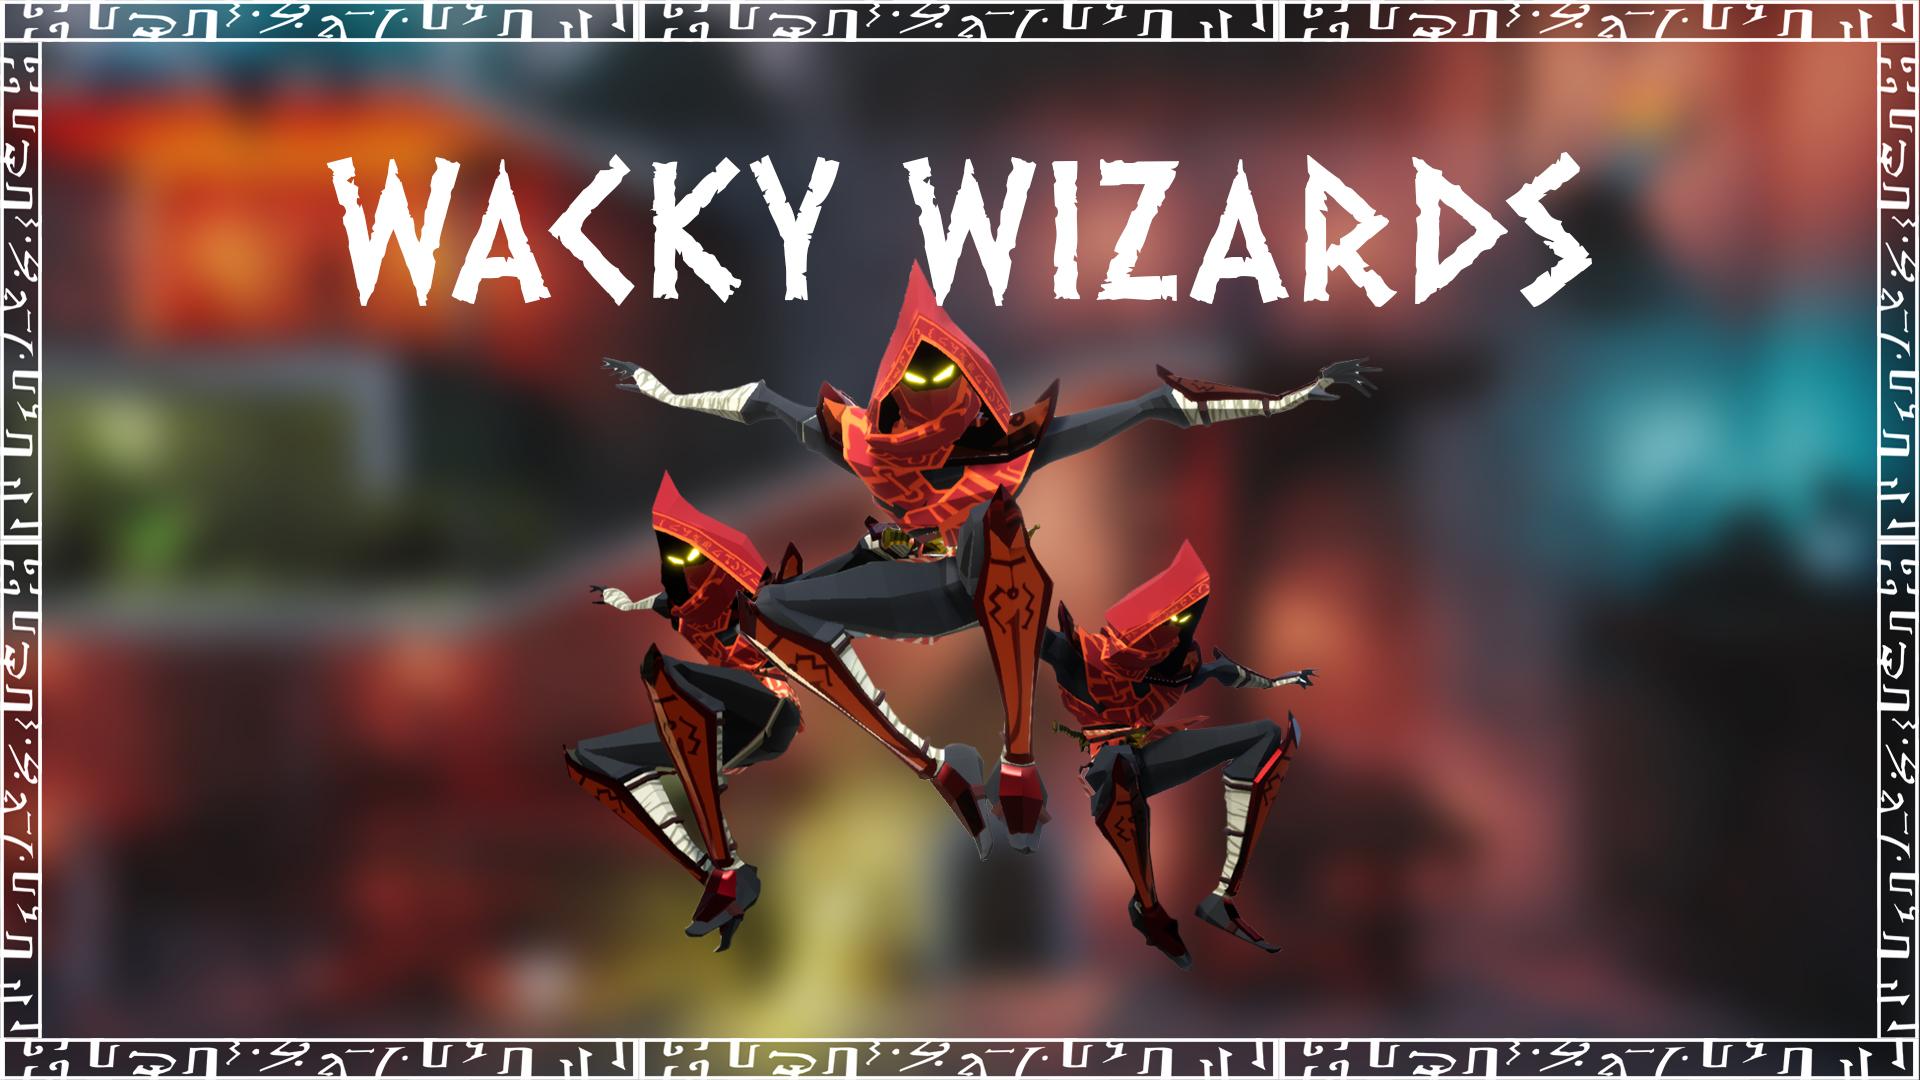 [Group 02] Wacky Wizards